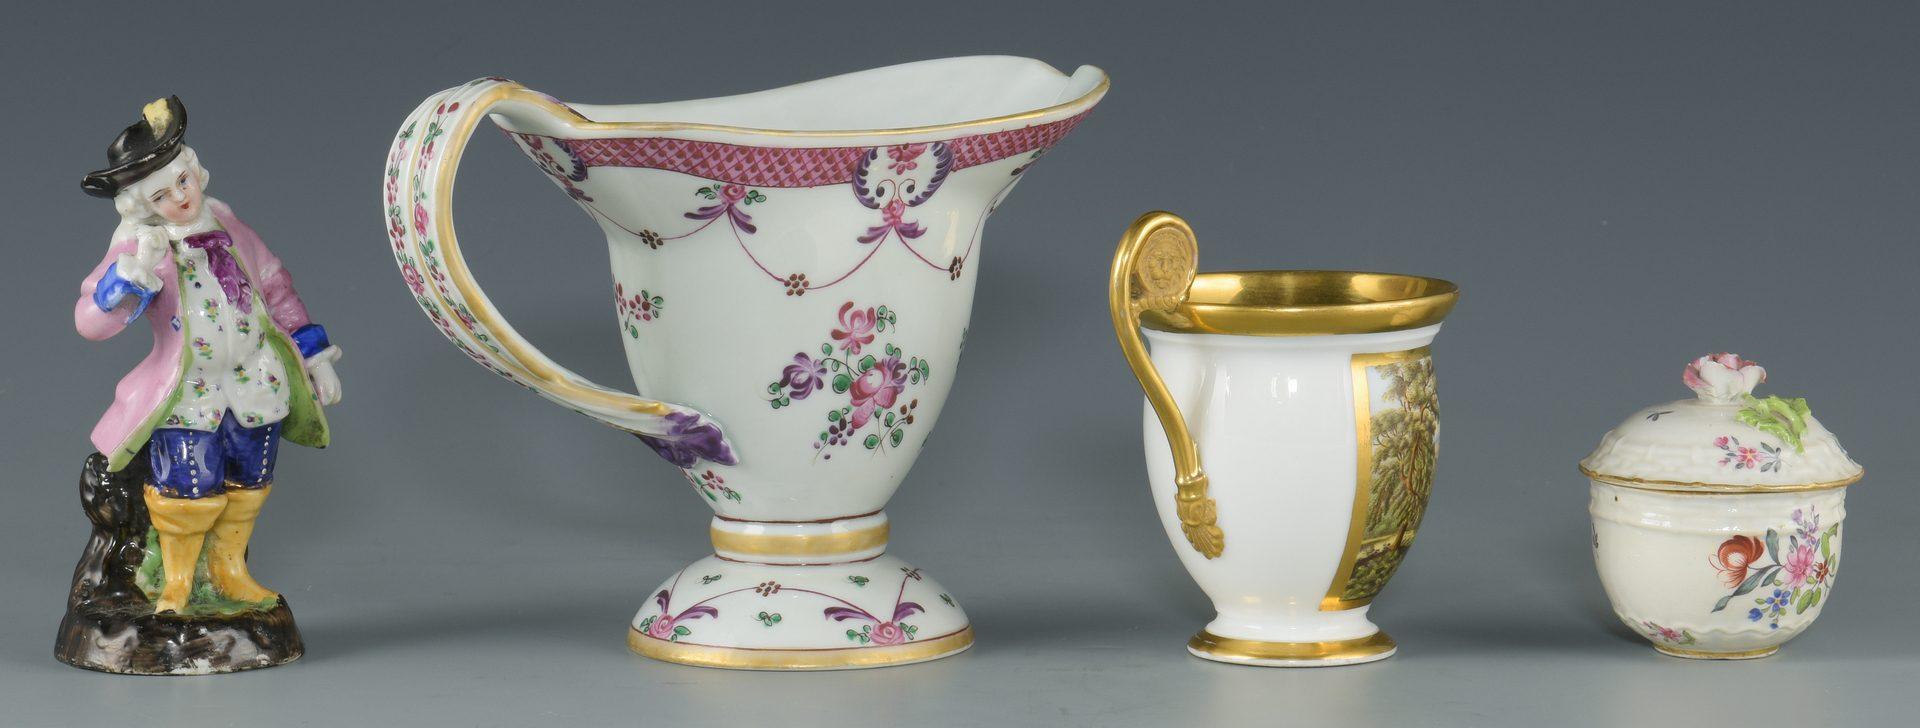 Lot : 4 European Porcelain items, incl. Samson